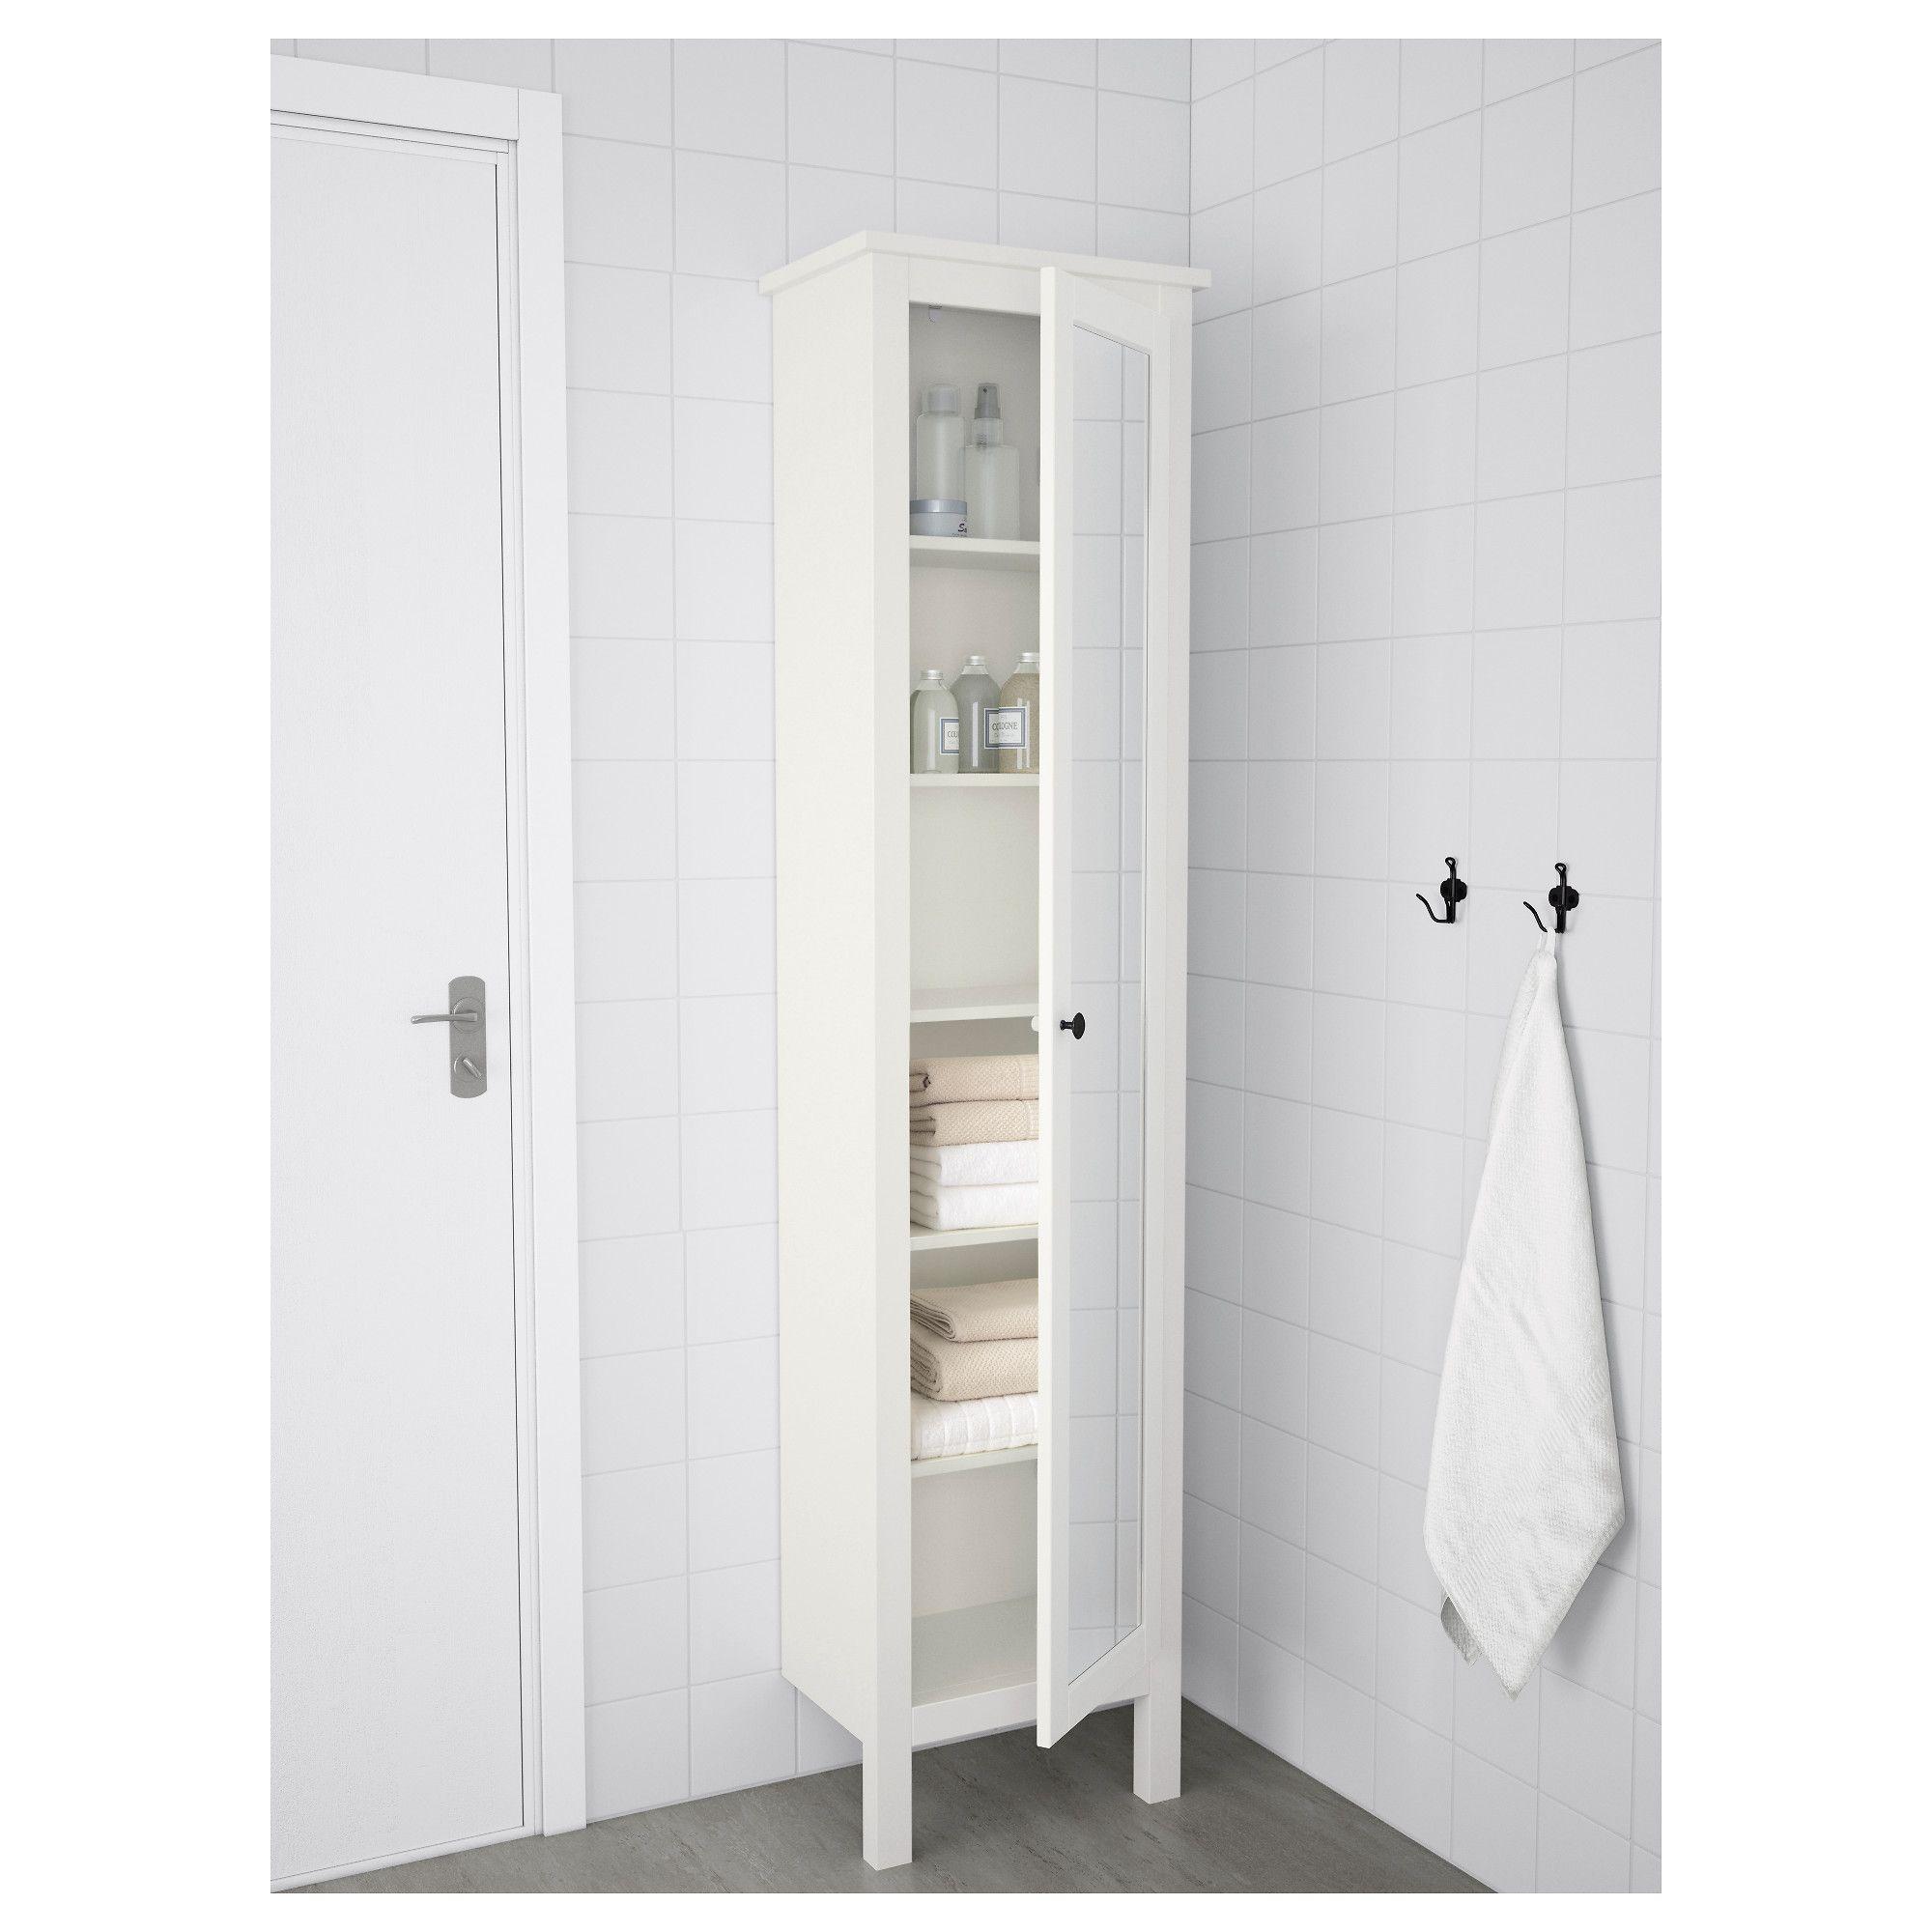 Badezimmer Schrank IKEA - Badezimmer-Schrank IKEA ...